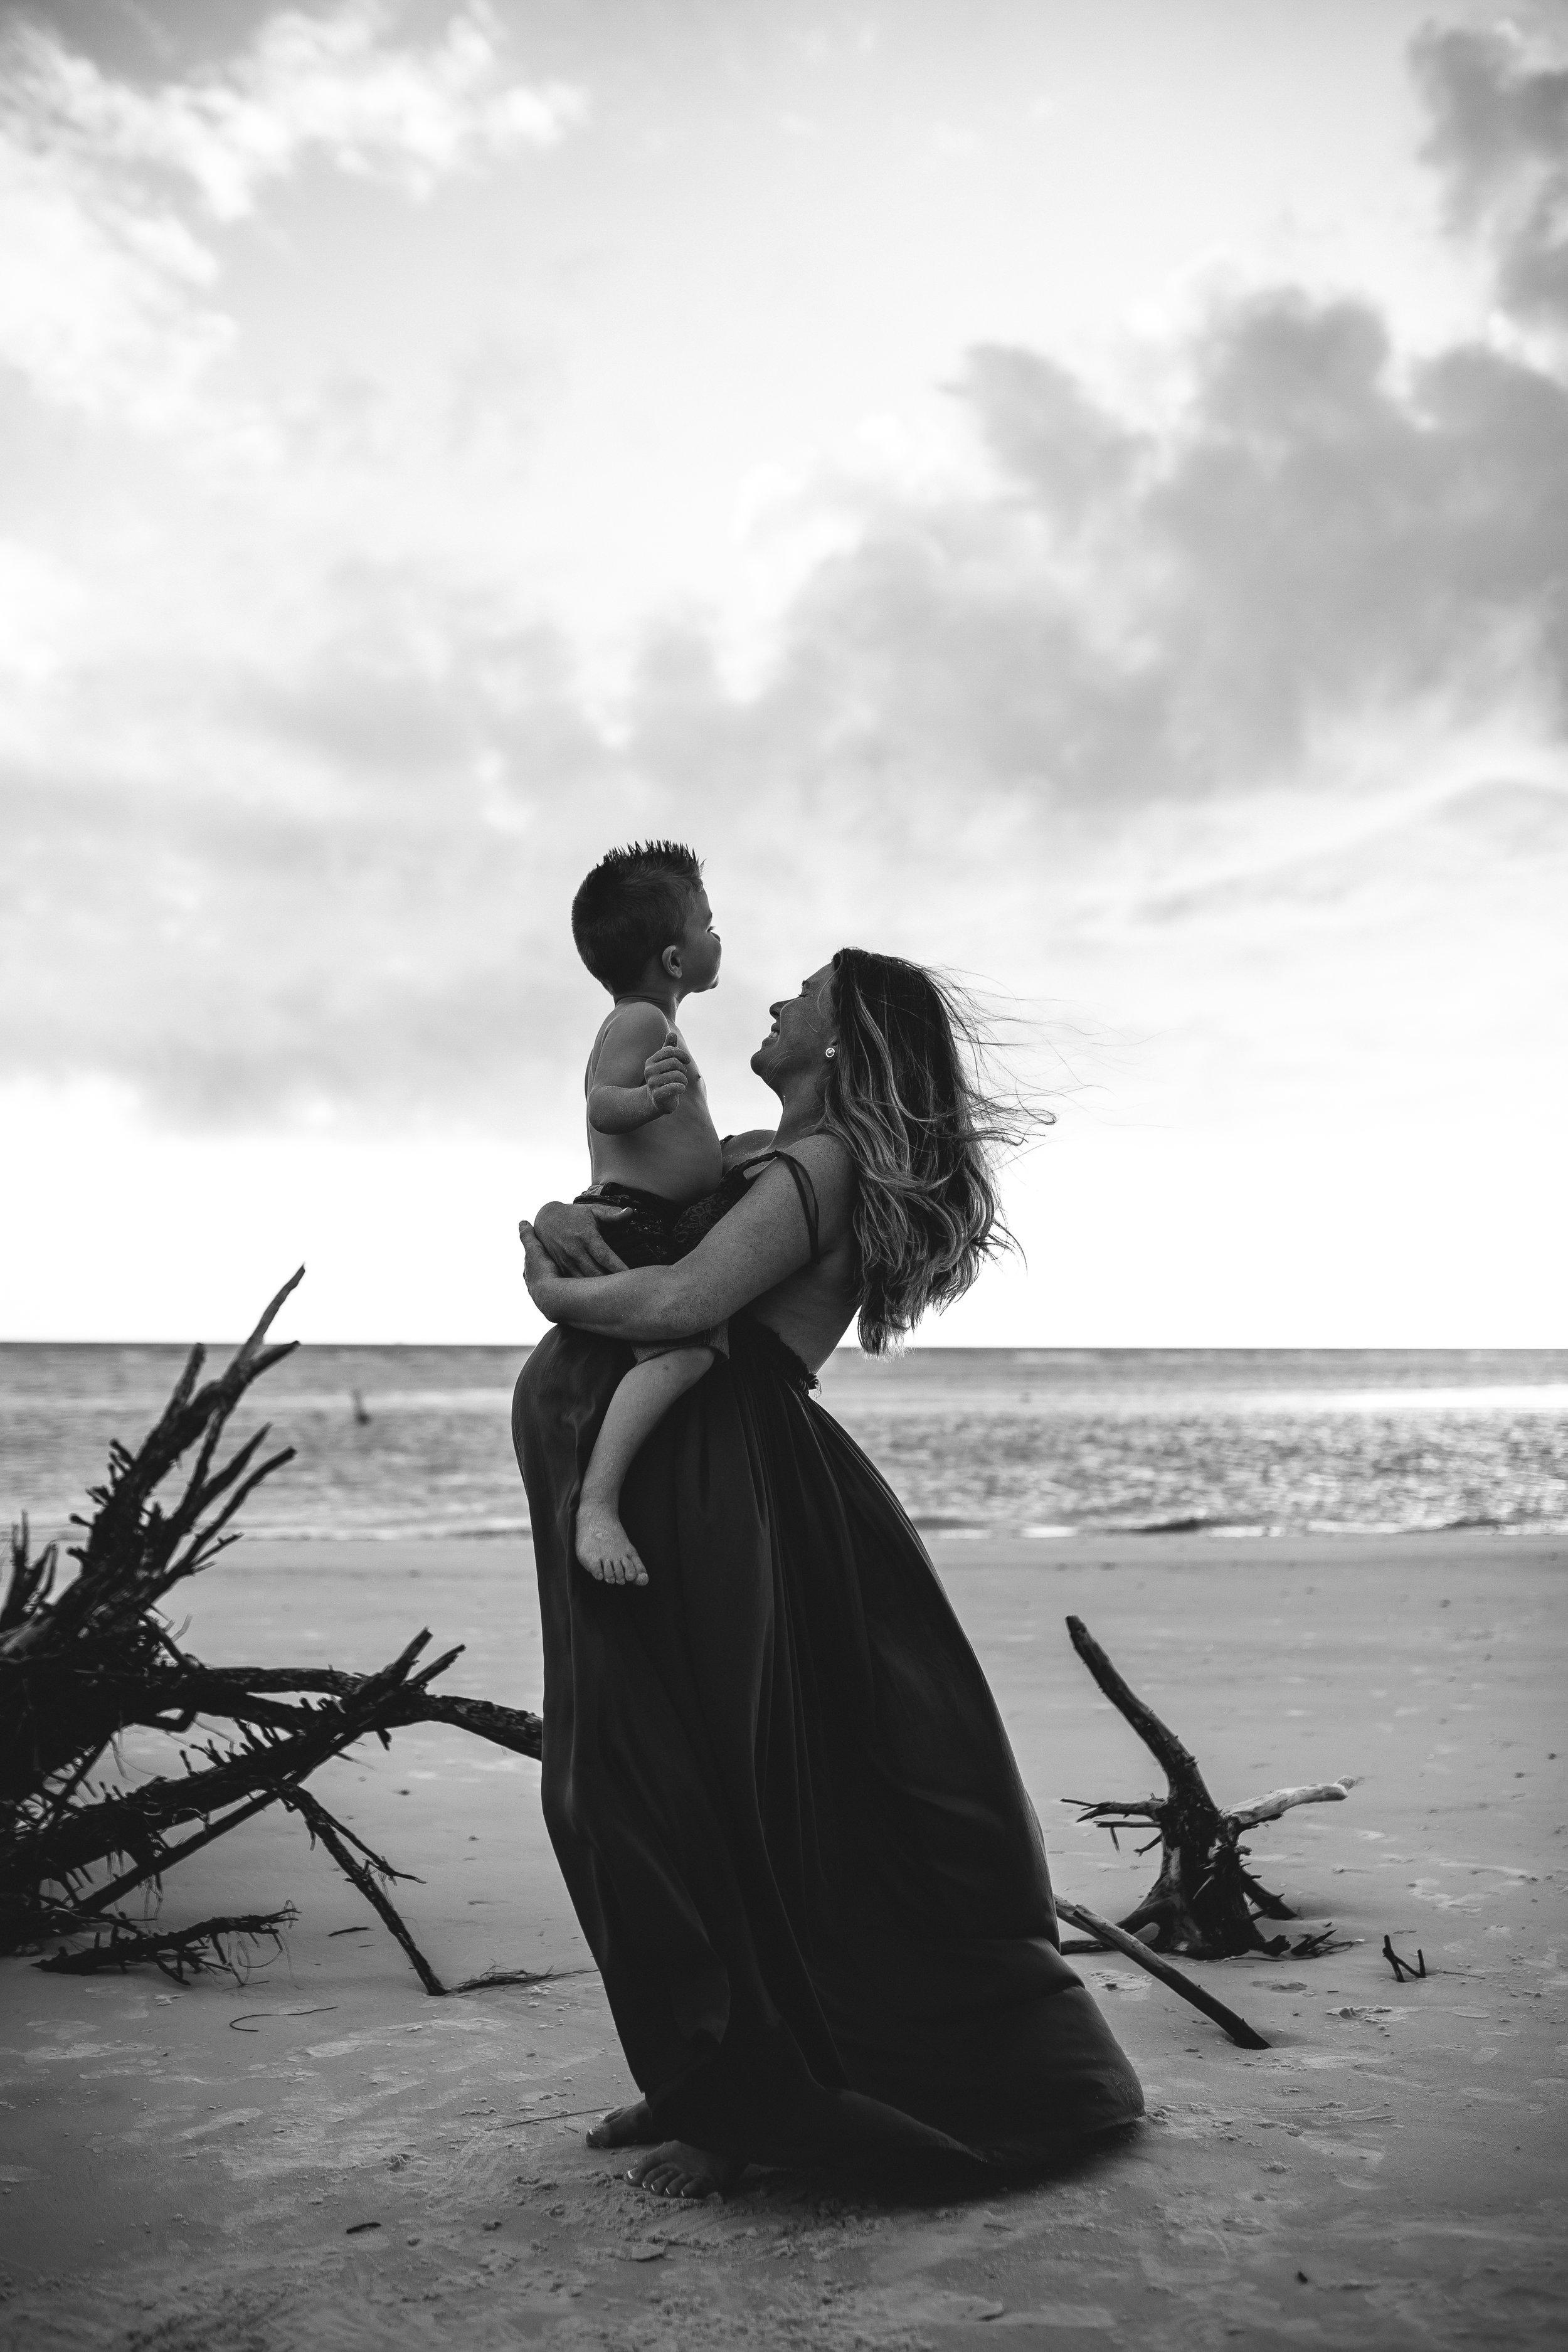 moody maternity photography, Tampa bay fl area